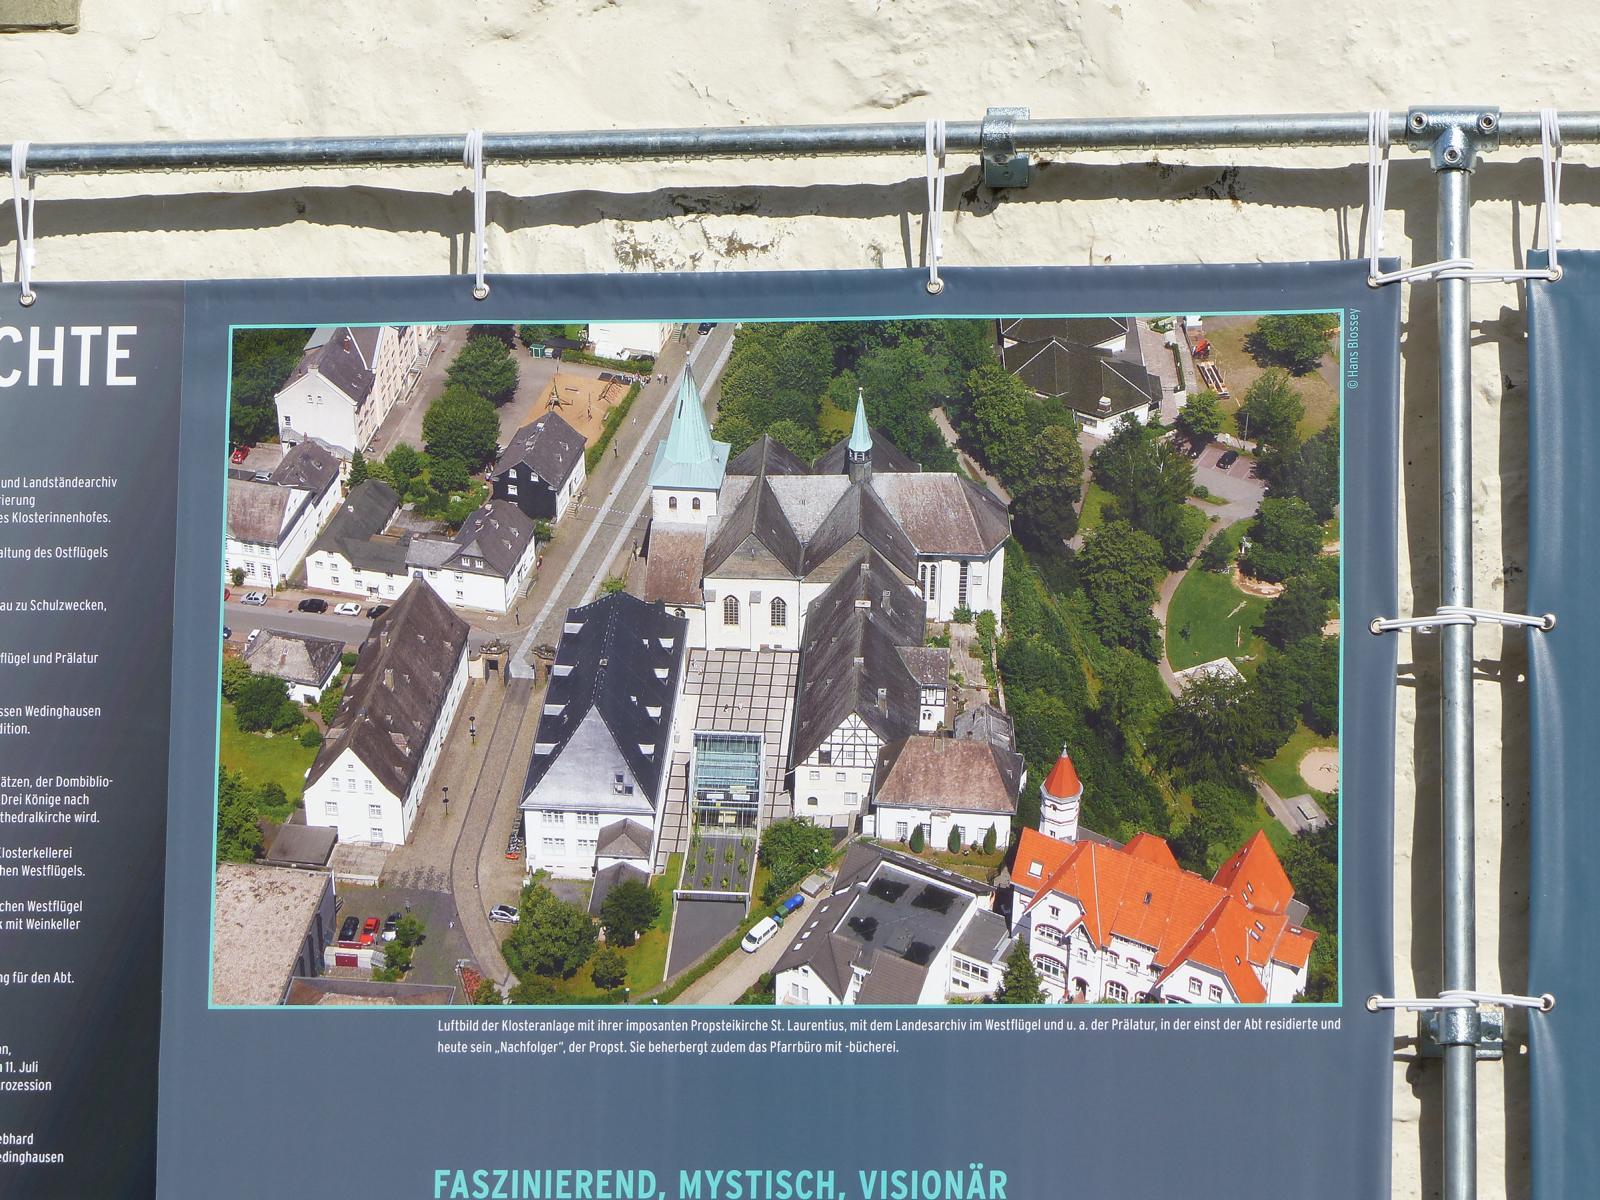 Arbeitskreis besucht das Kloster Wedinghausen in Arnsberg